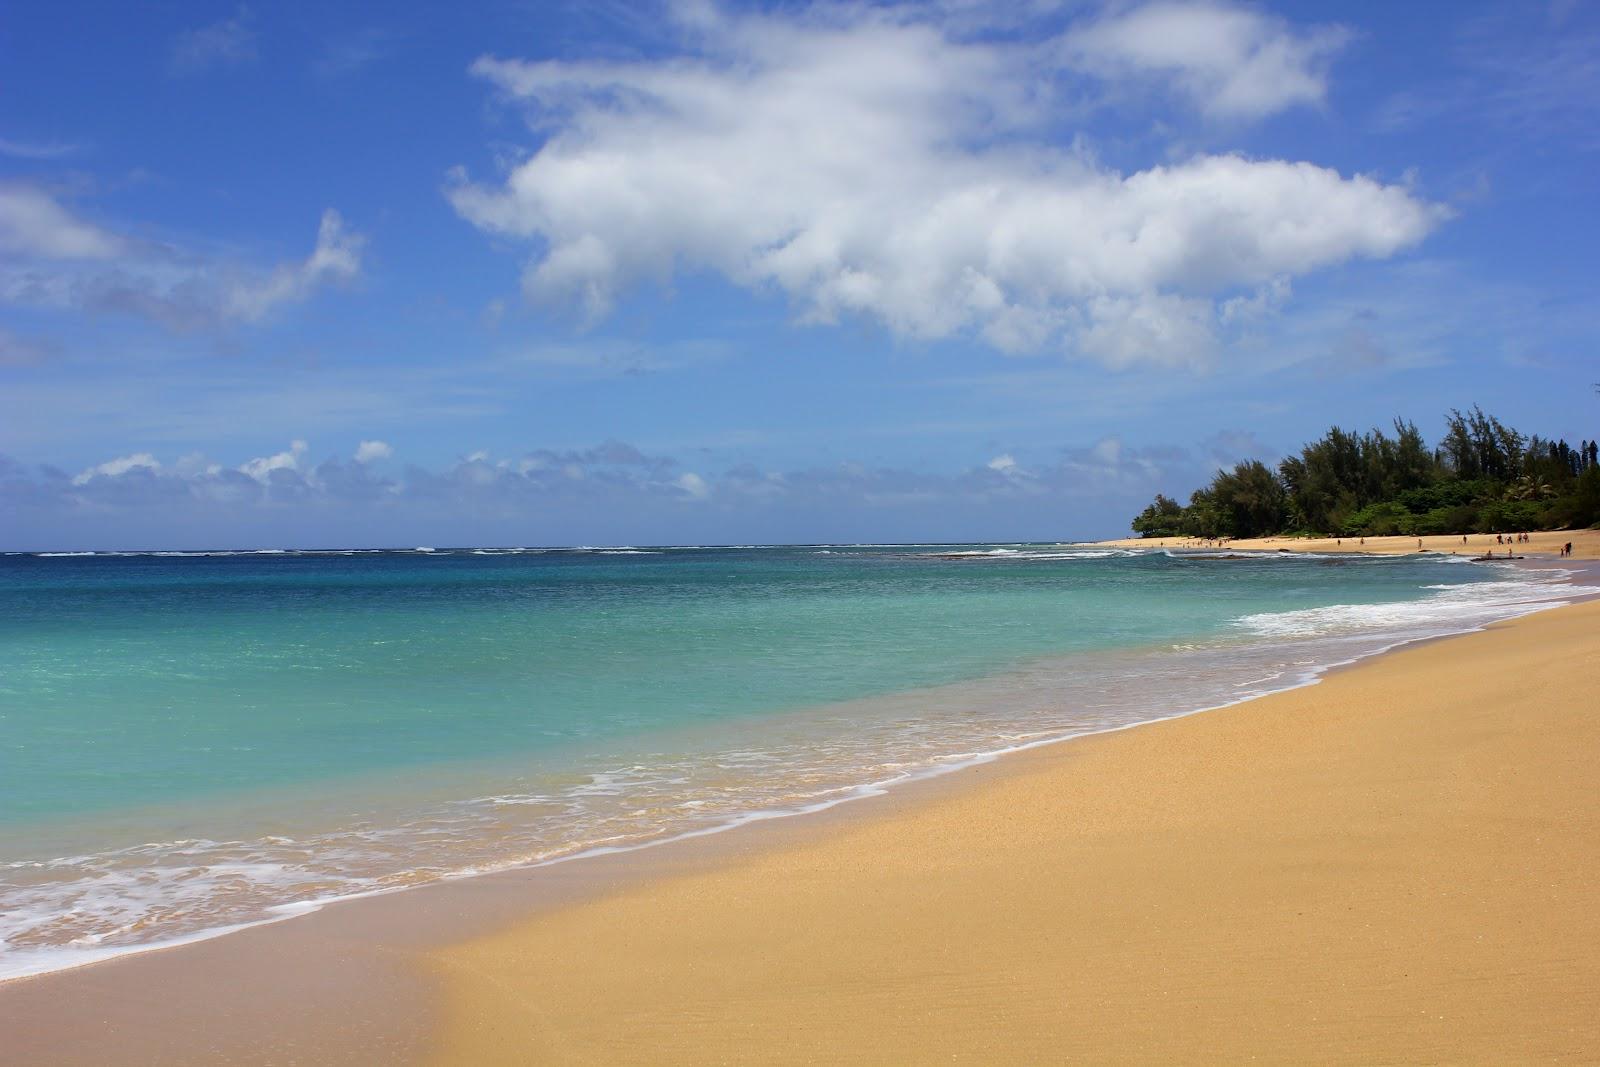 Kelley Maria: Kauai - Part 4